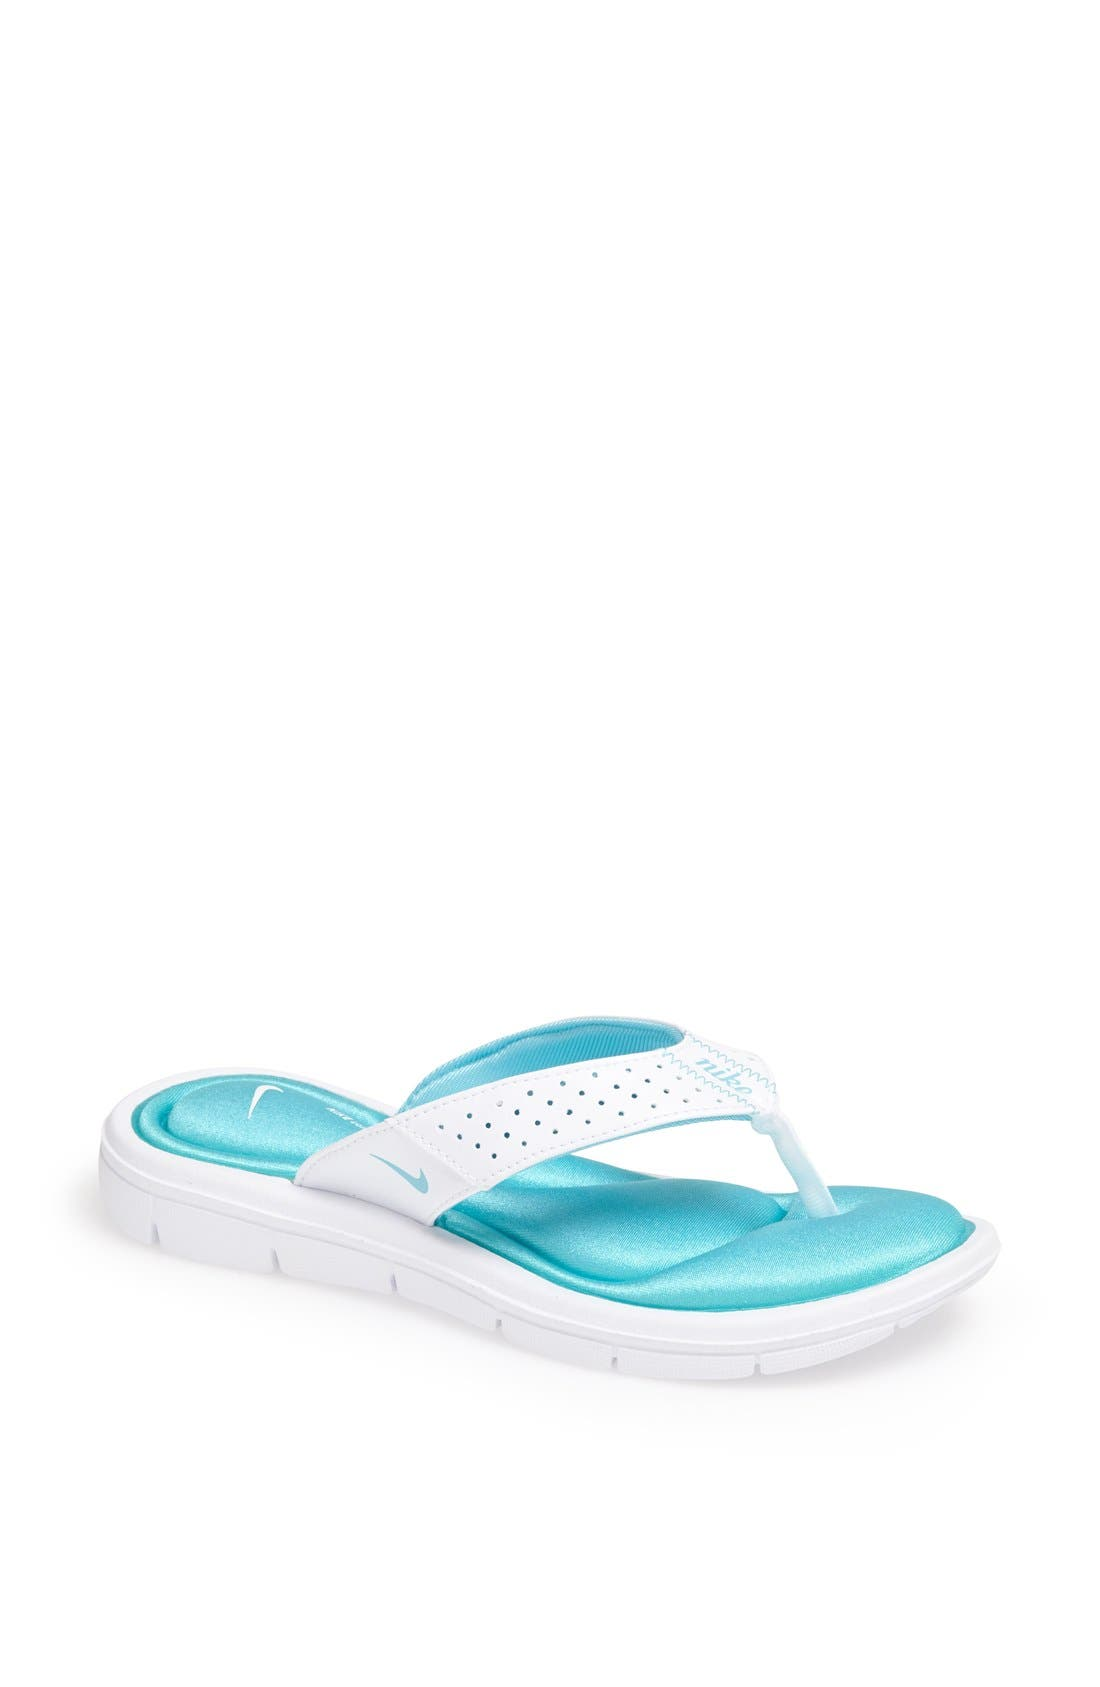 Main Image - Nike 'Comfort' Sandal (Women)